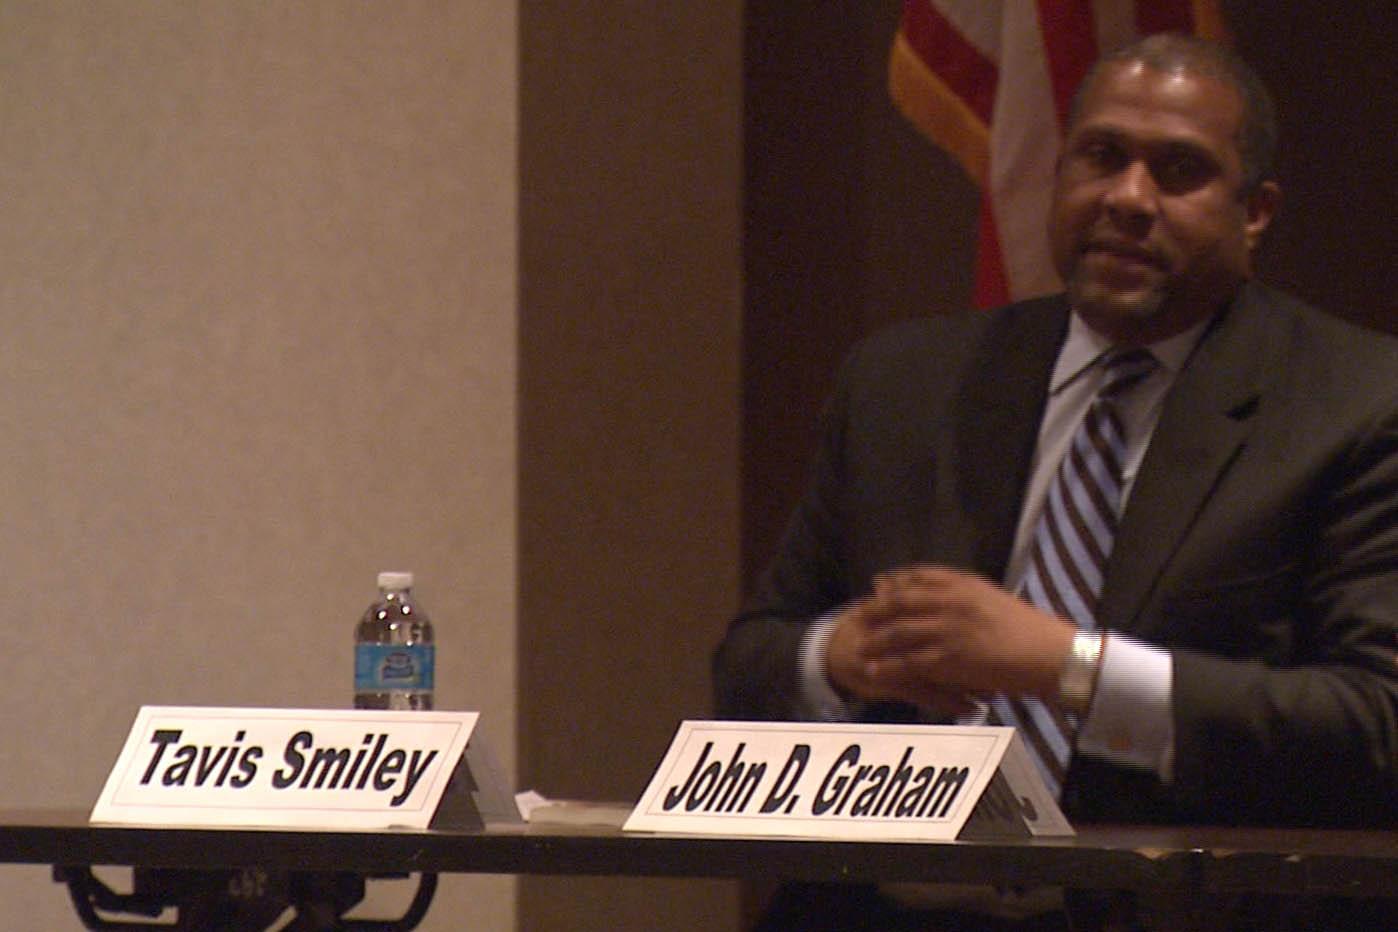 IU Alum Tavis Smiley in Indianapolis at poverty panel.